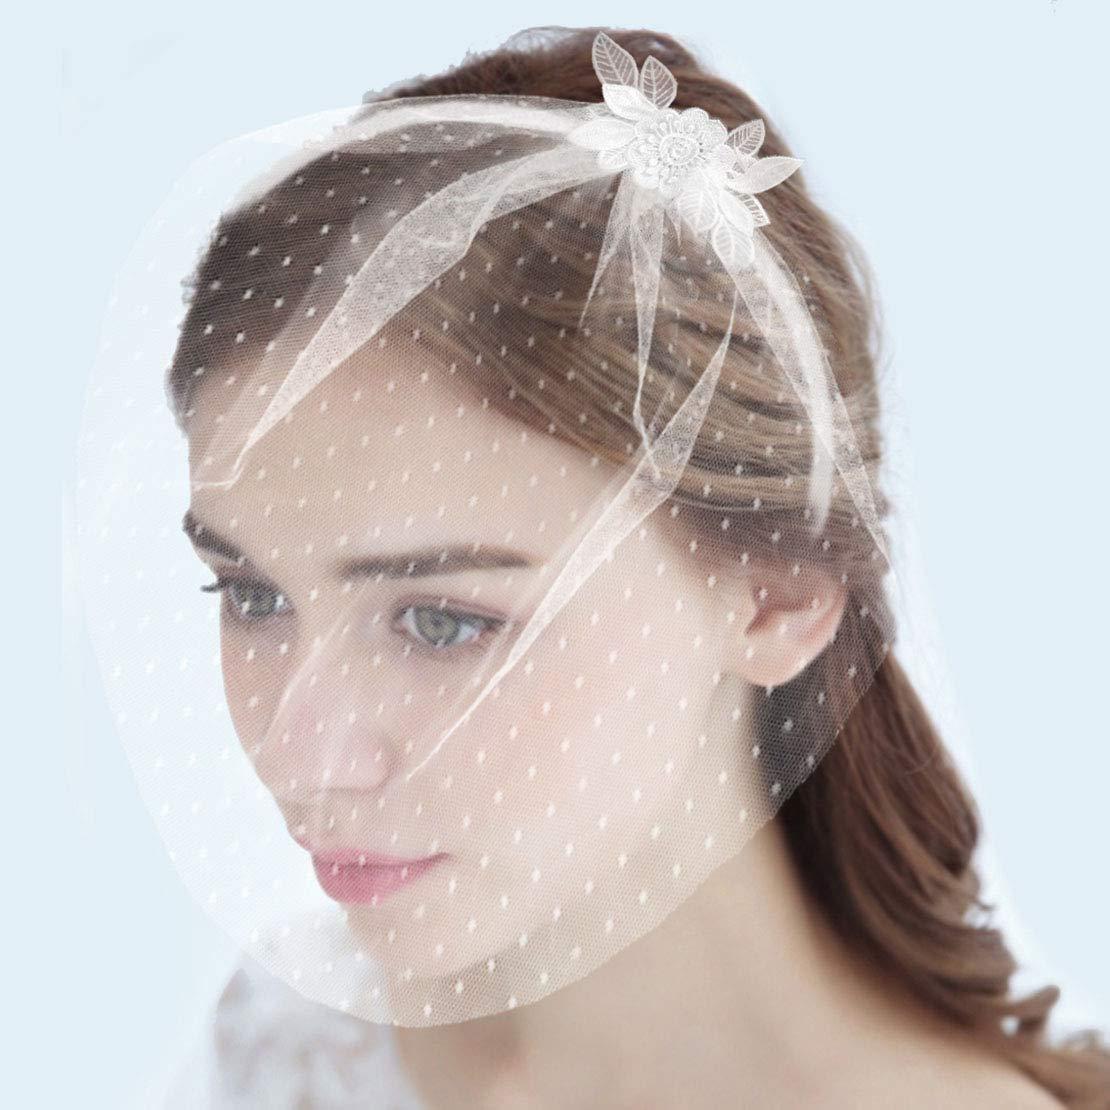 Fangsen 1T Bridal Wedding Dot Veil Fascinator Floral Lace Headband Tea Party Hats for Women (White)